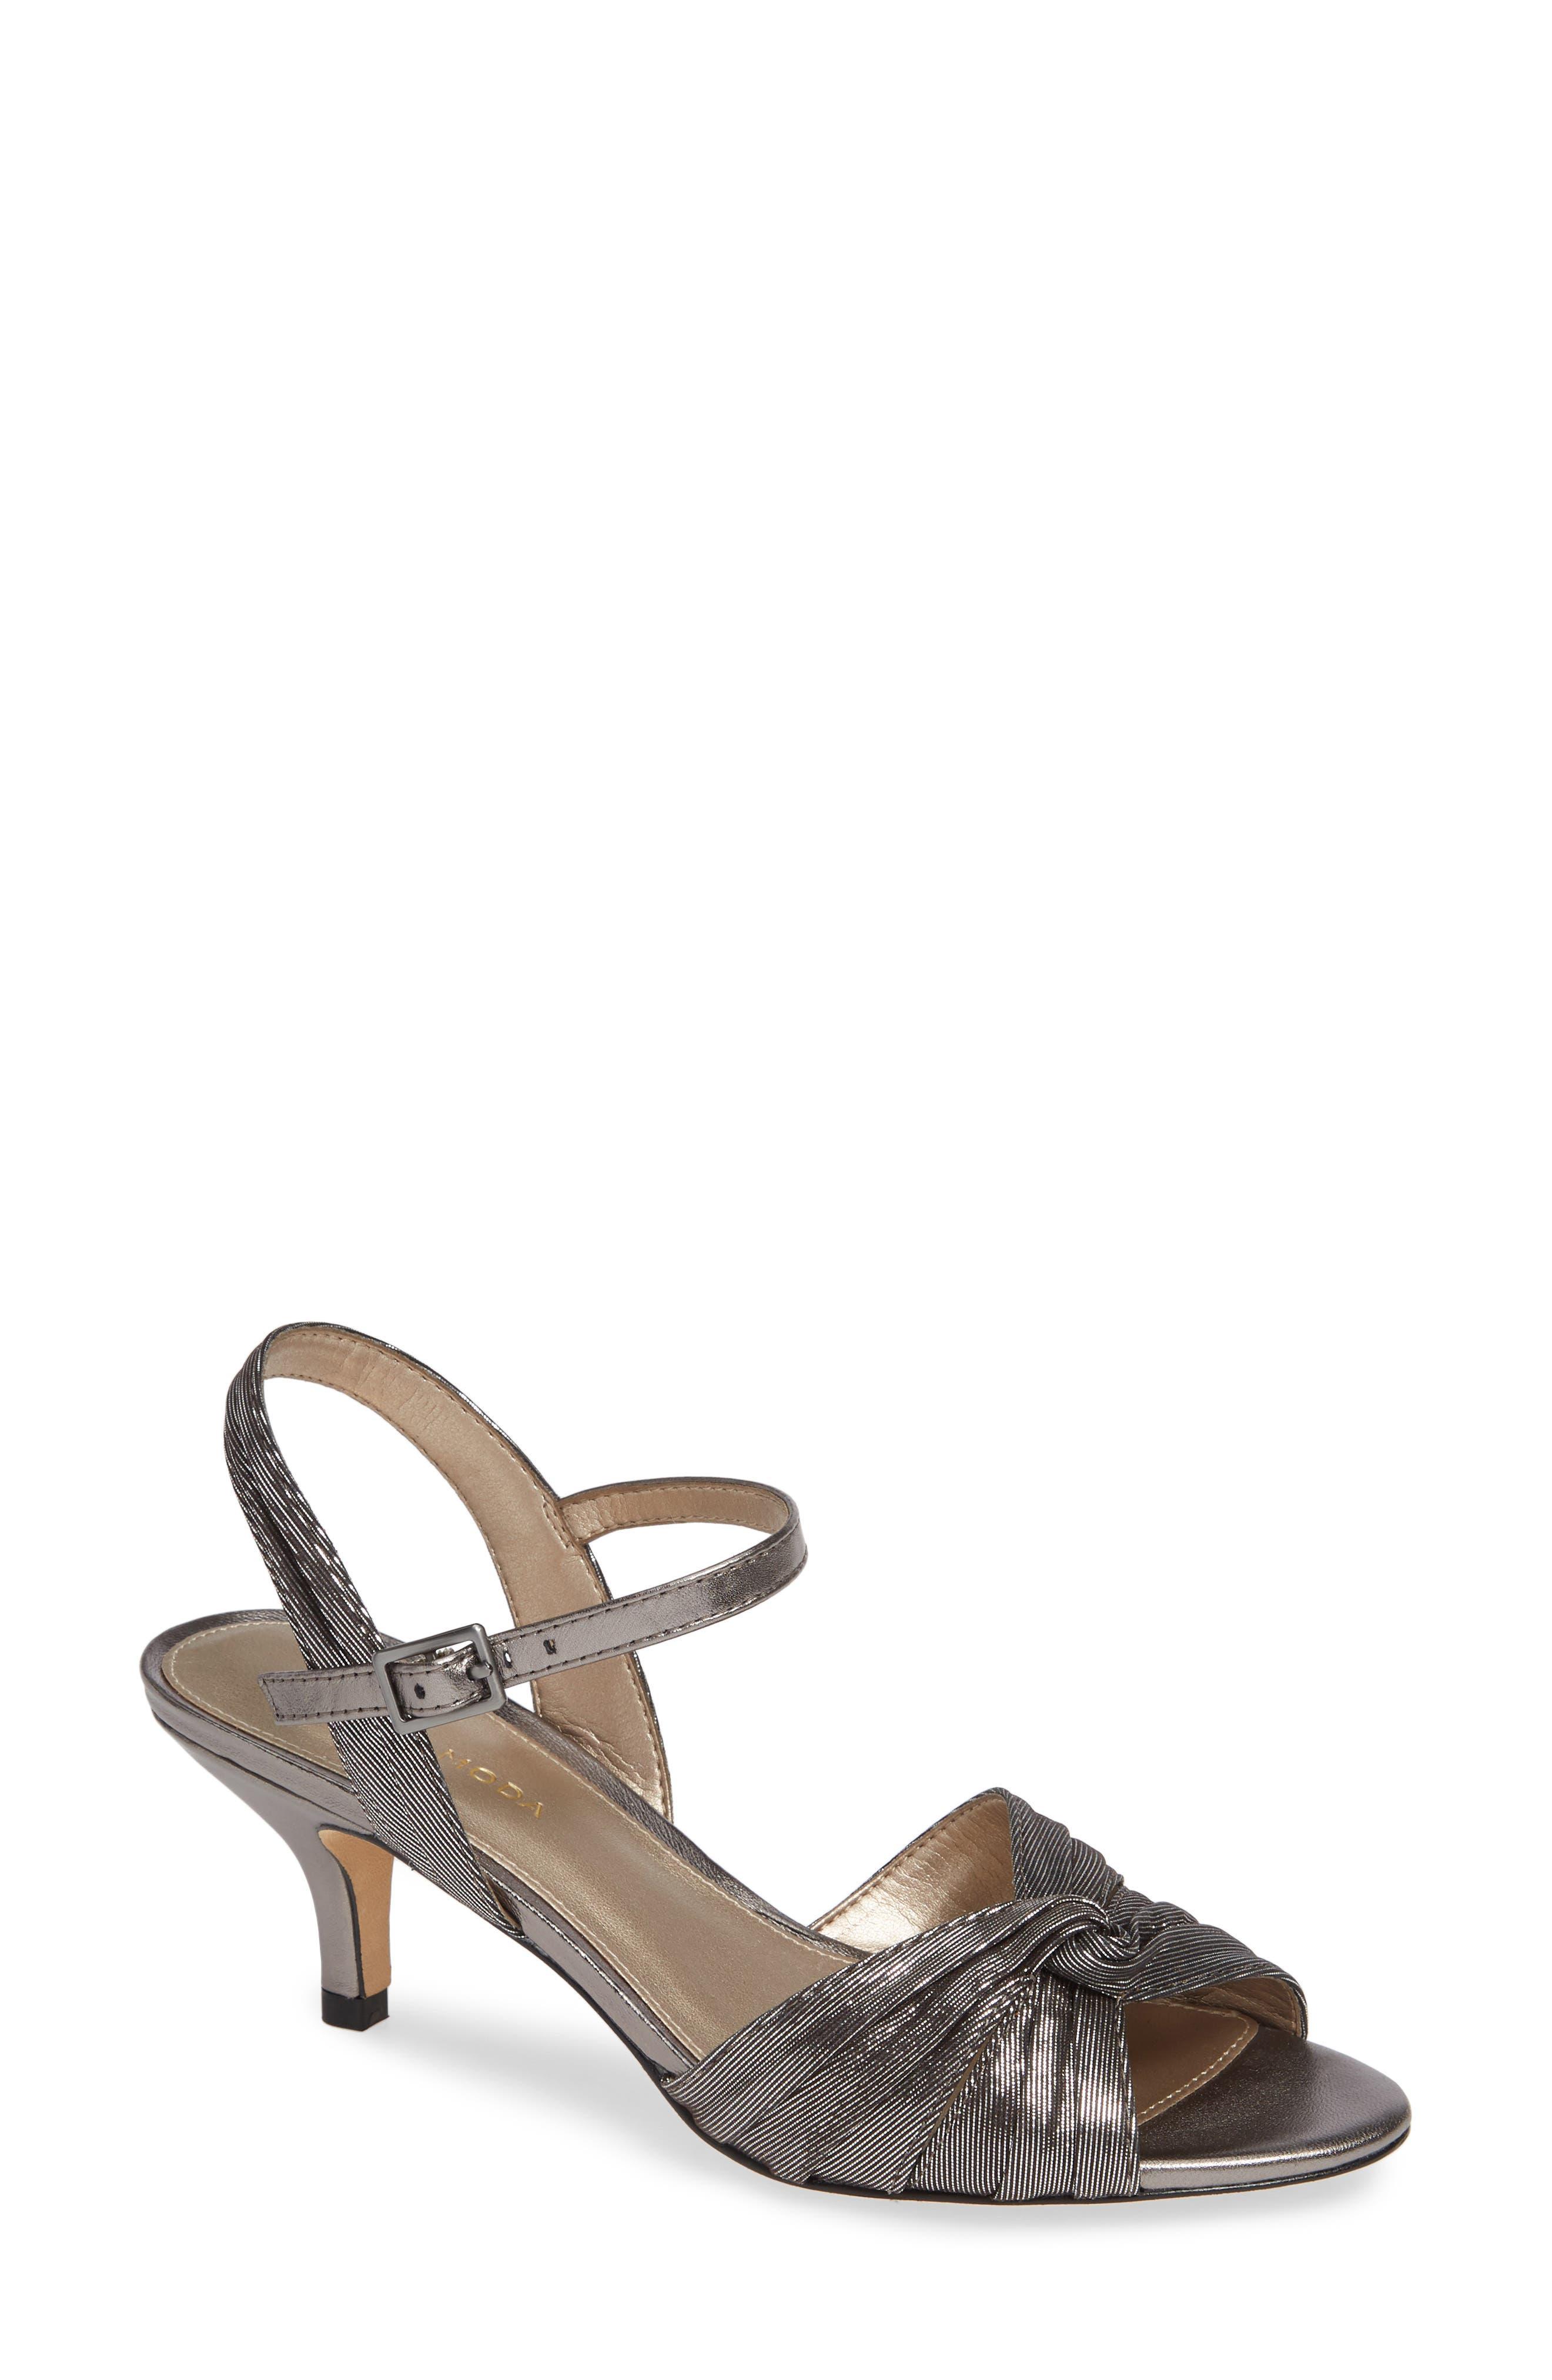 Pelle Moda Iliza Sandal, Metallic